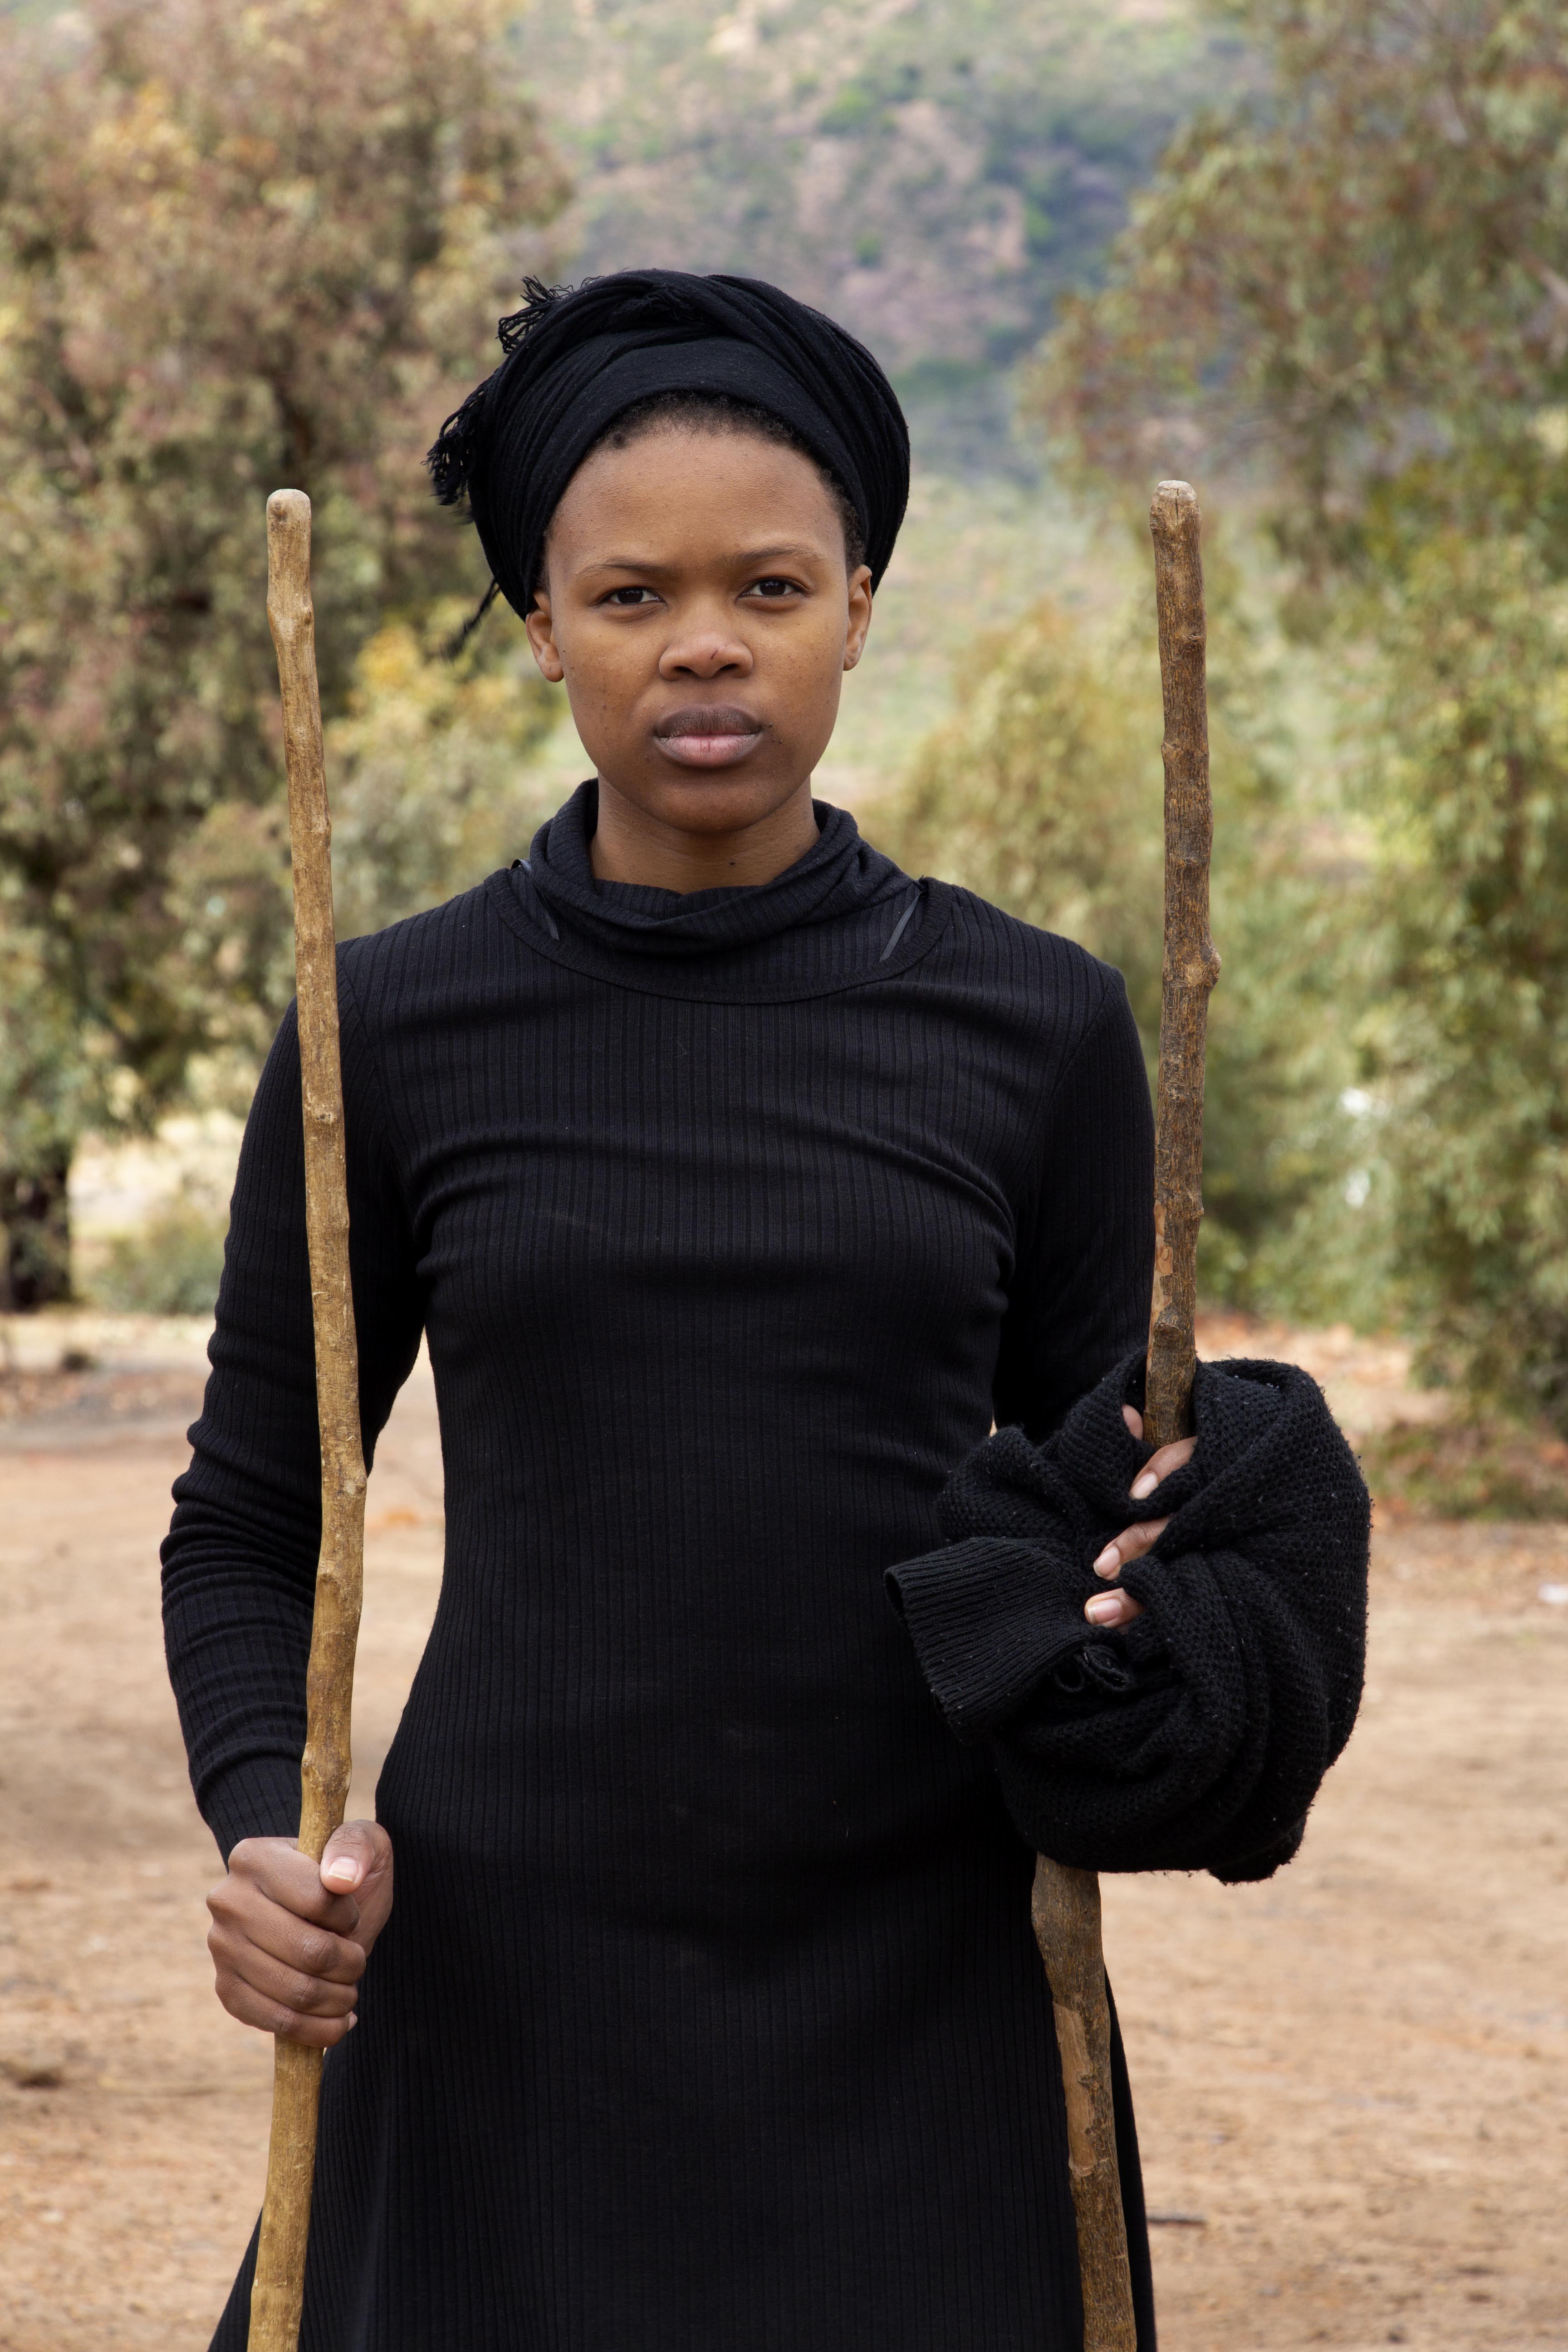 Qula taken by Thandiwe Msebenzi